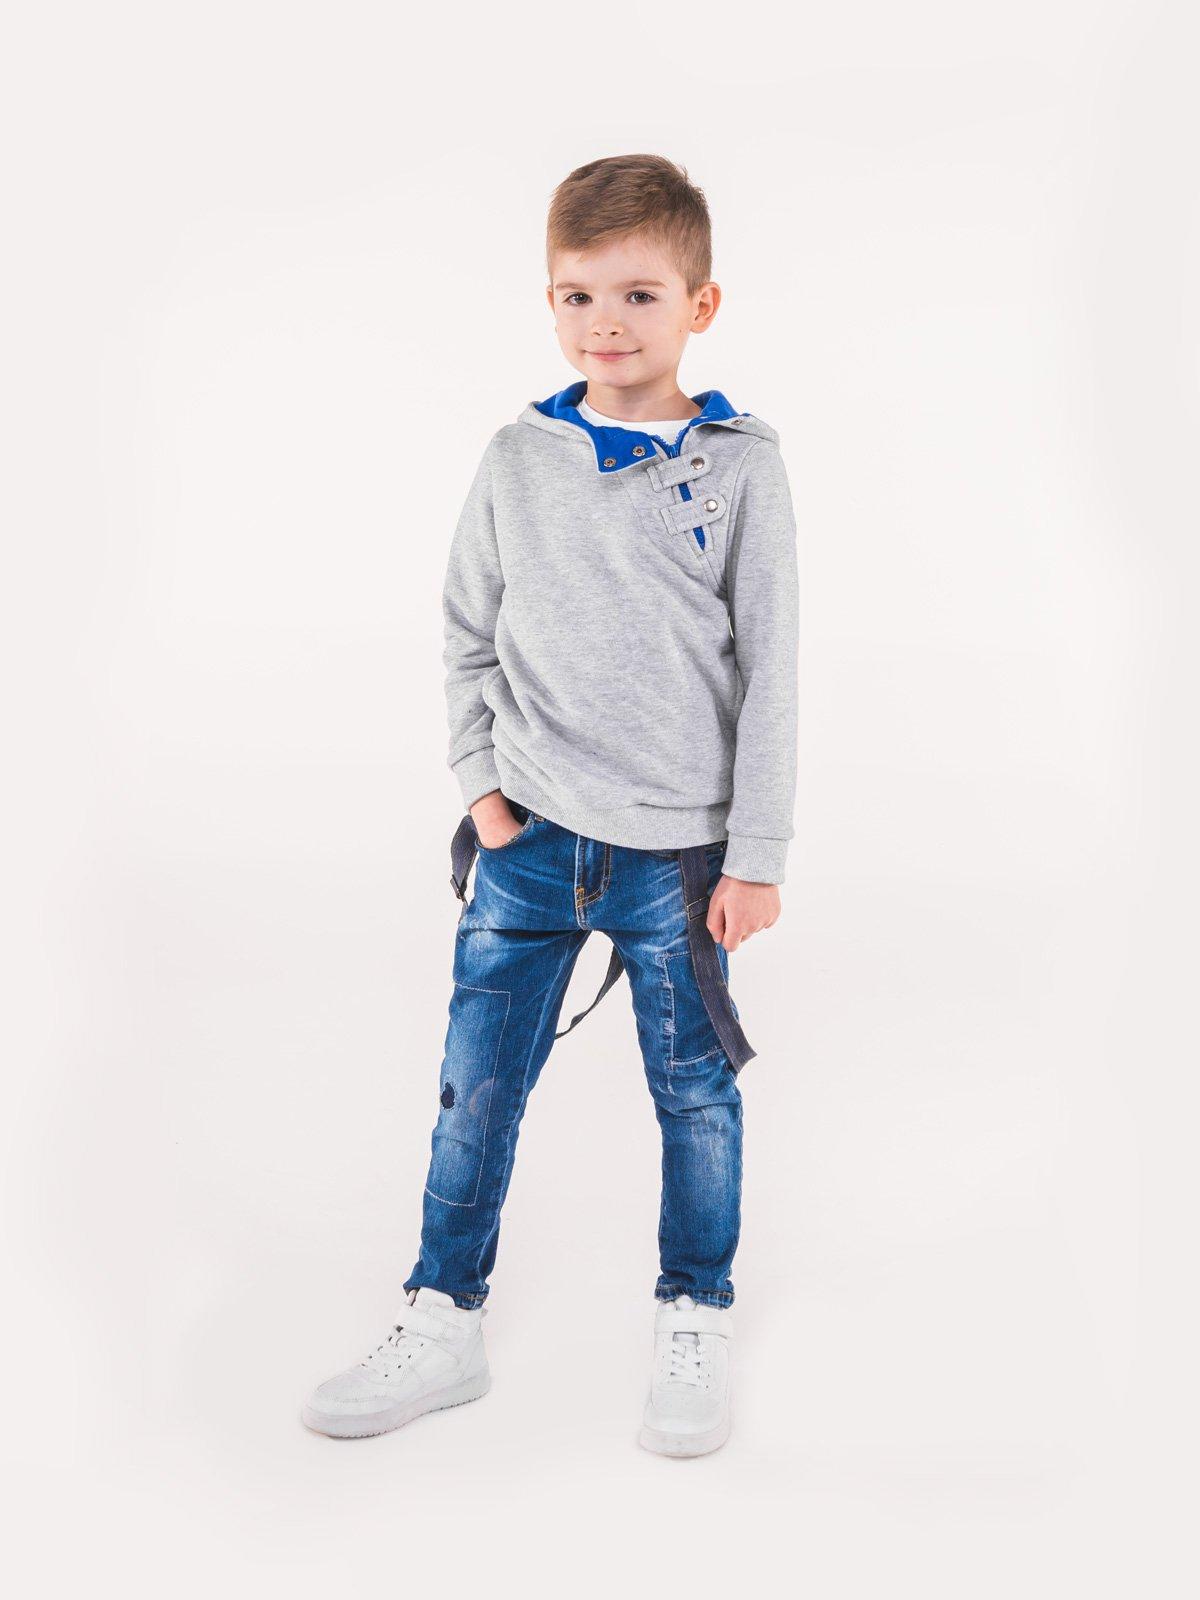 Bluza Kb005 Kids - Szara/niebieska